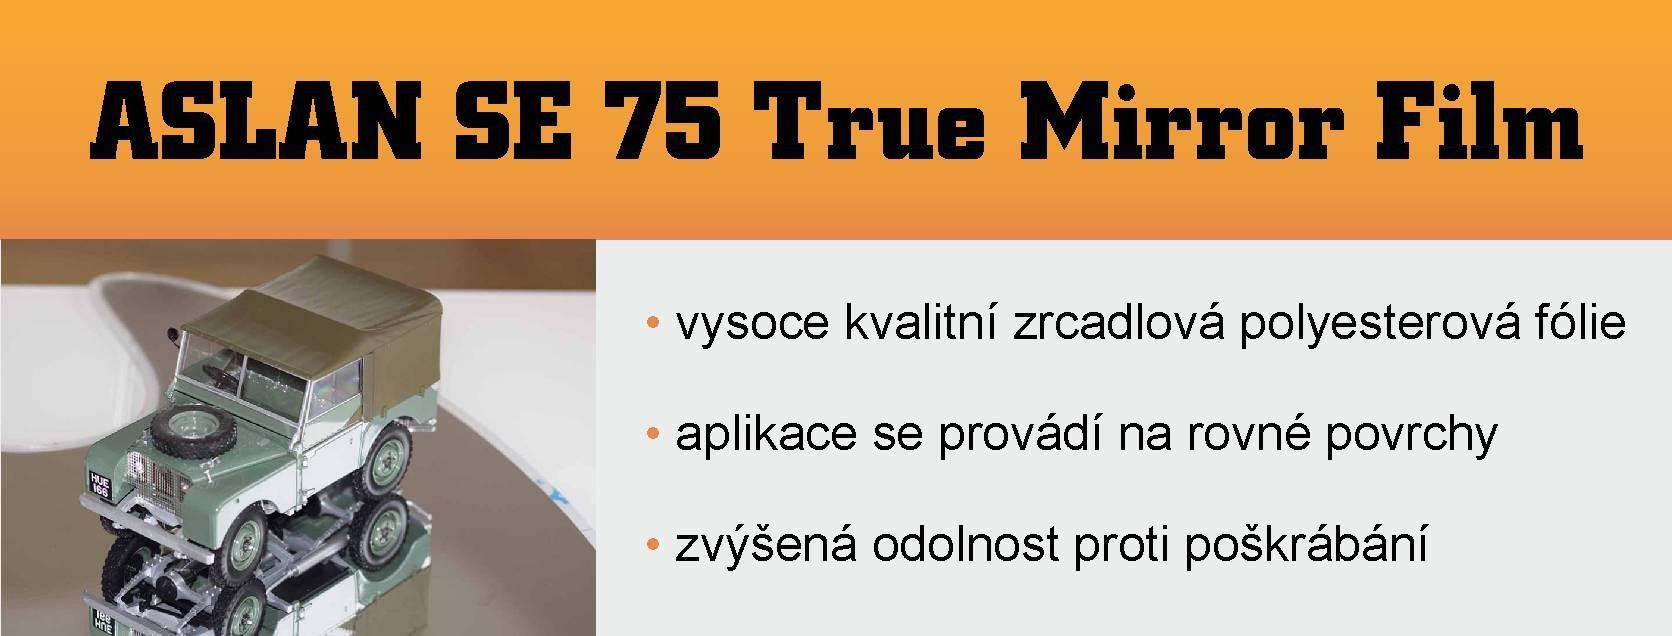 Aslan_SE_75_True_Mirror_Film